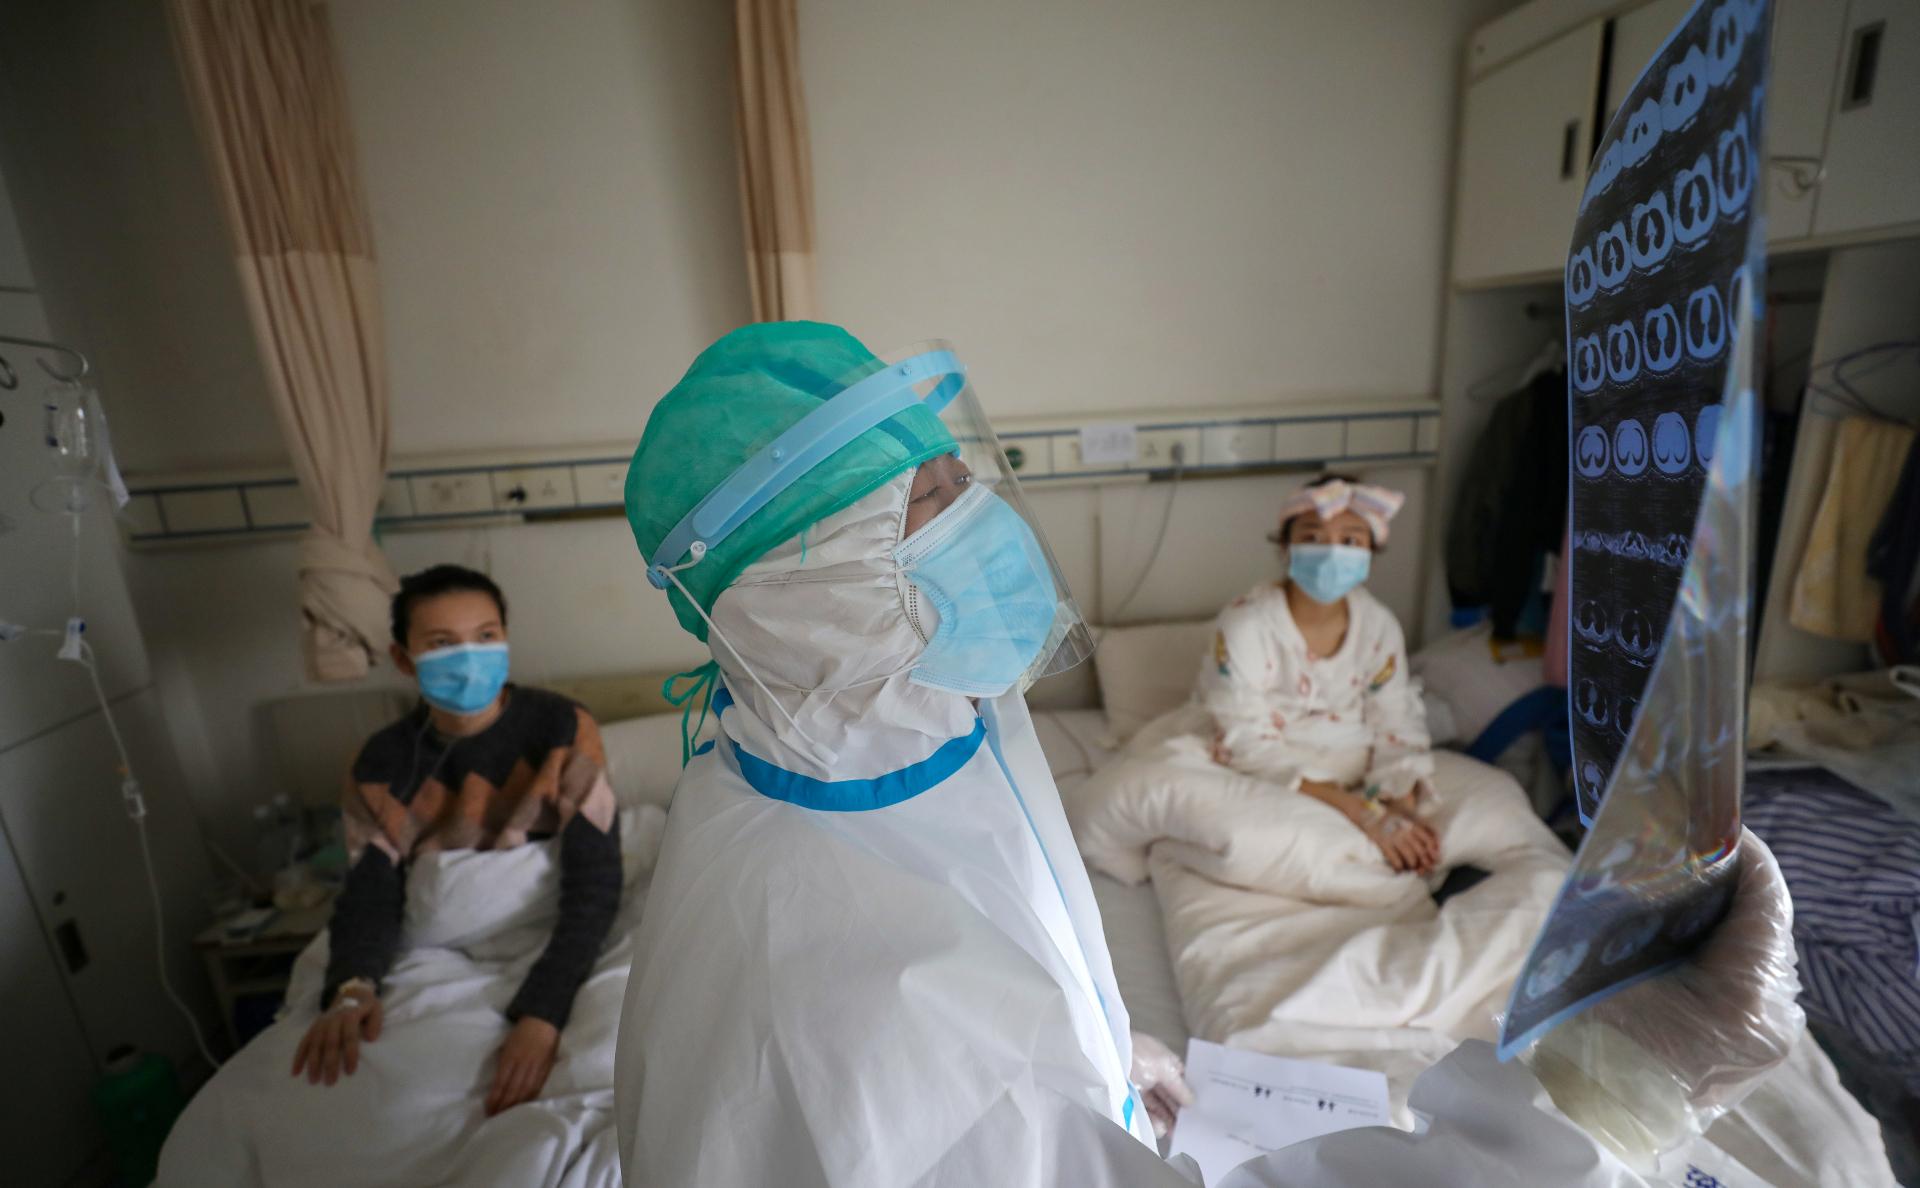 Фото: China Daily / Reuters